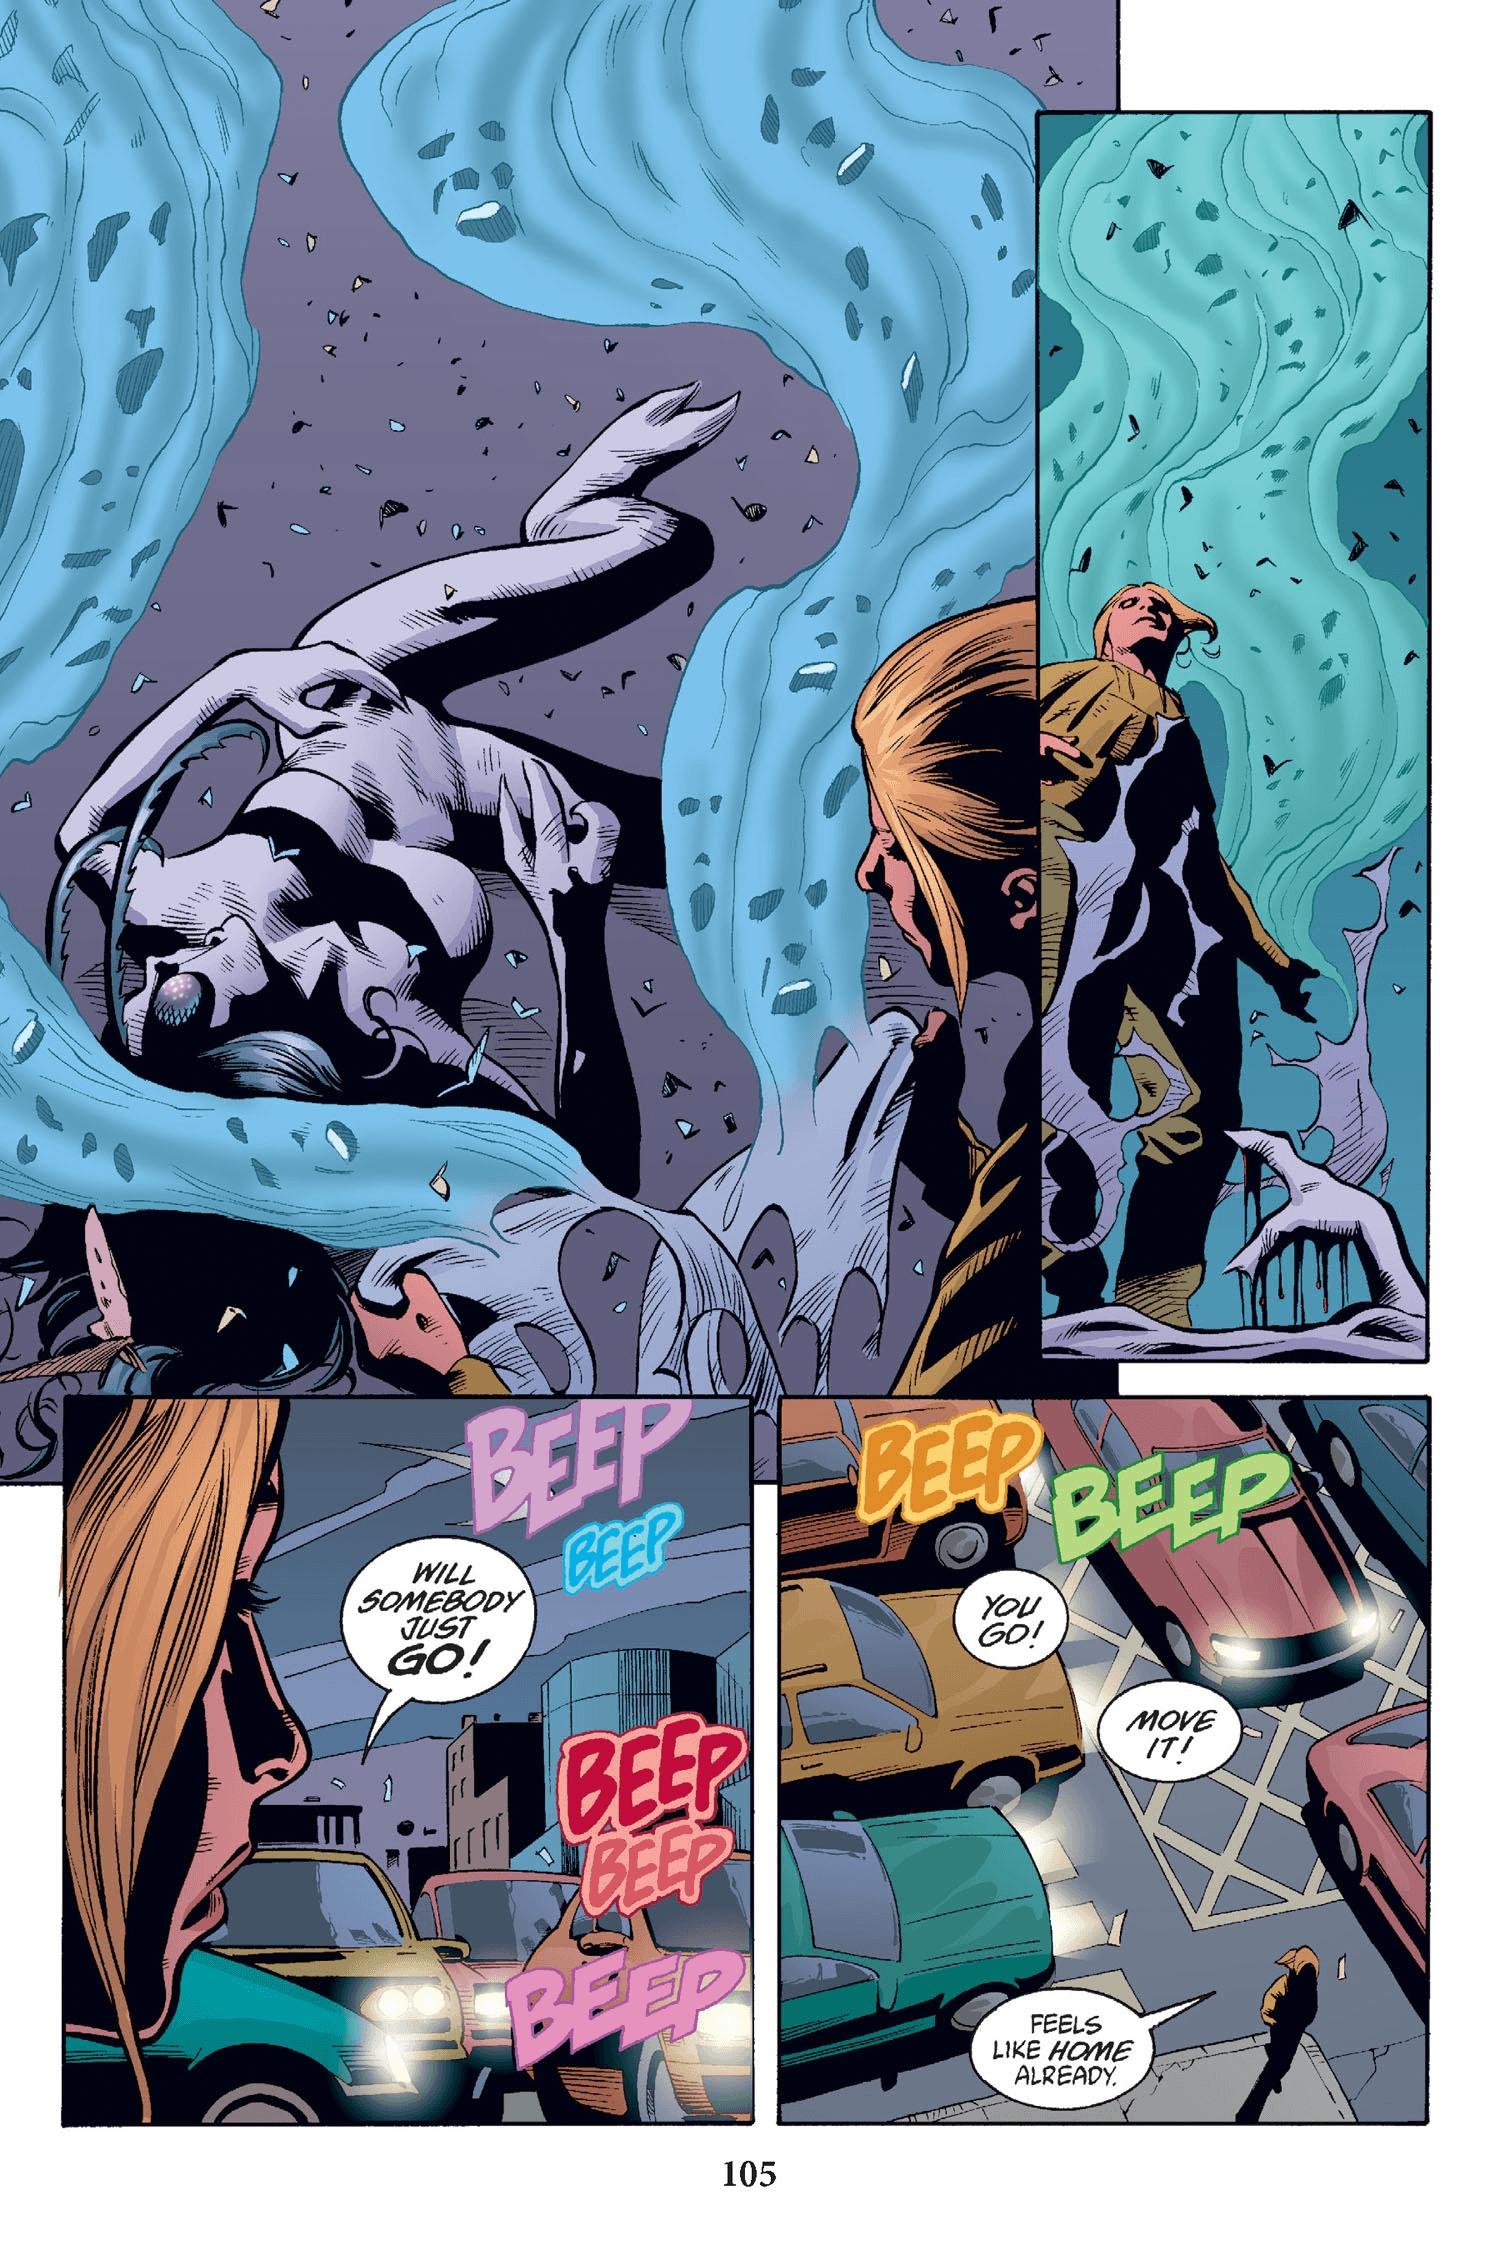 Read online Buffy the Vampire Slayer: Omnibus comic -  Issue # TPB 2 - 102